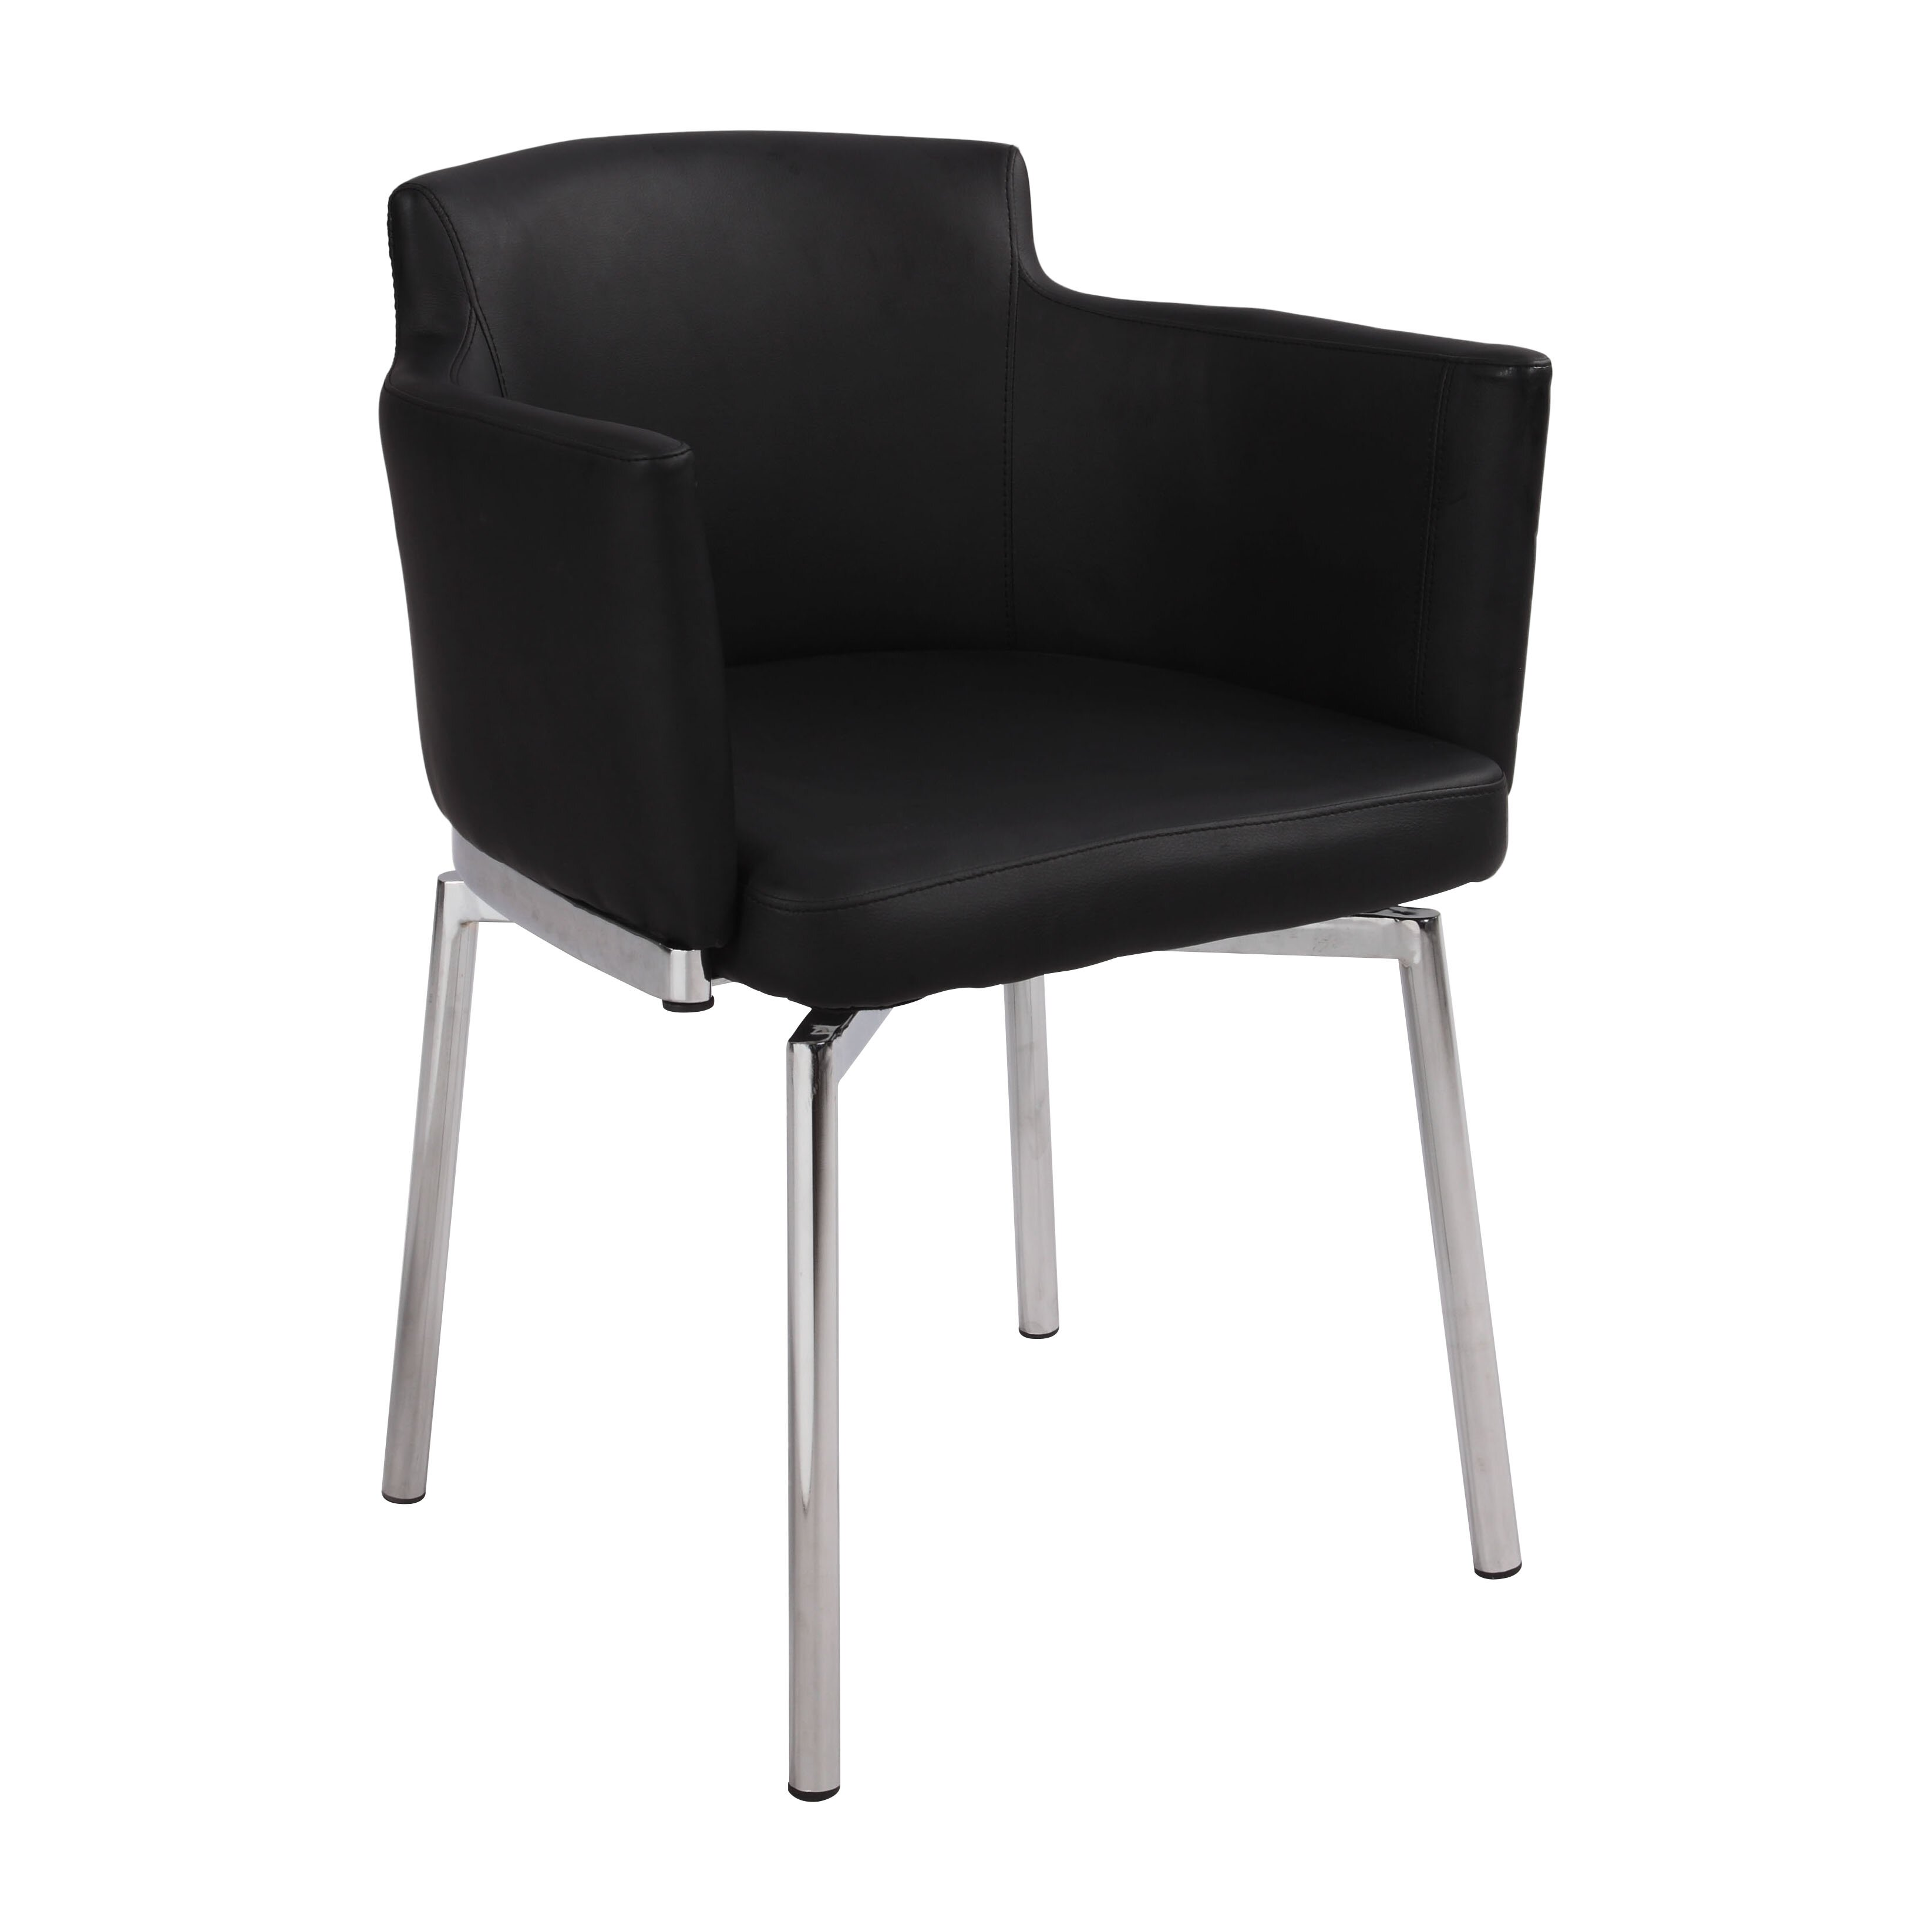 Chintaly Dusty Club Style Swivel Arm Chair Reviews Wayfair